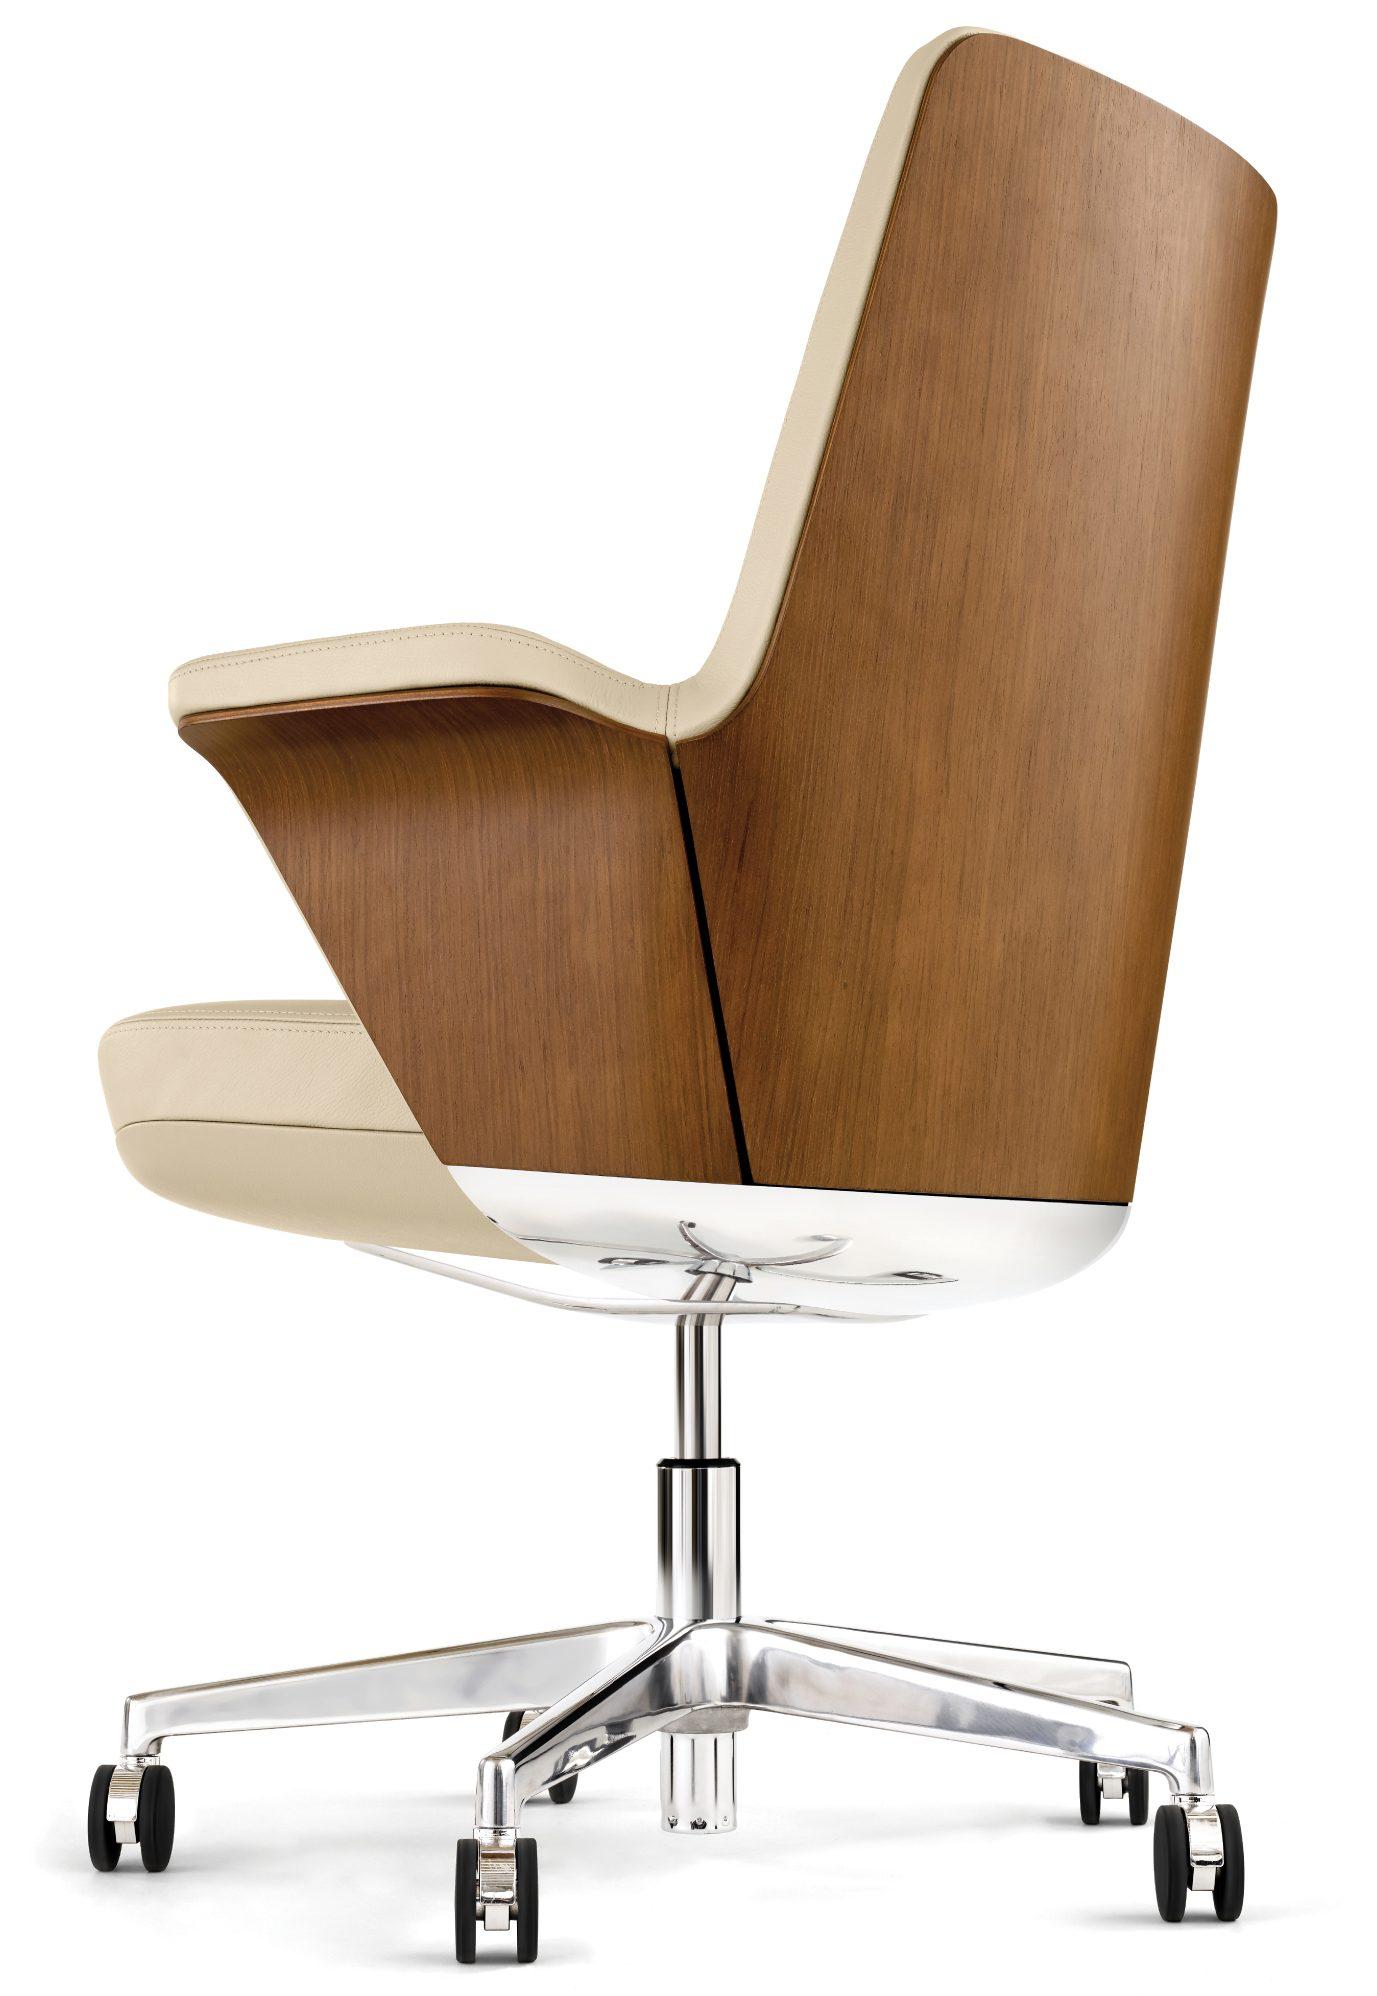 Closeup of Humanscale Summa executive chair